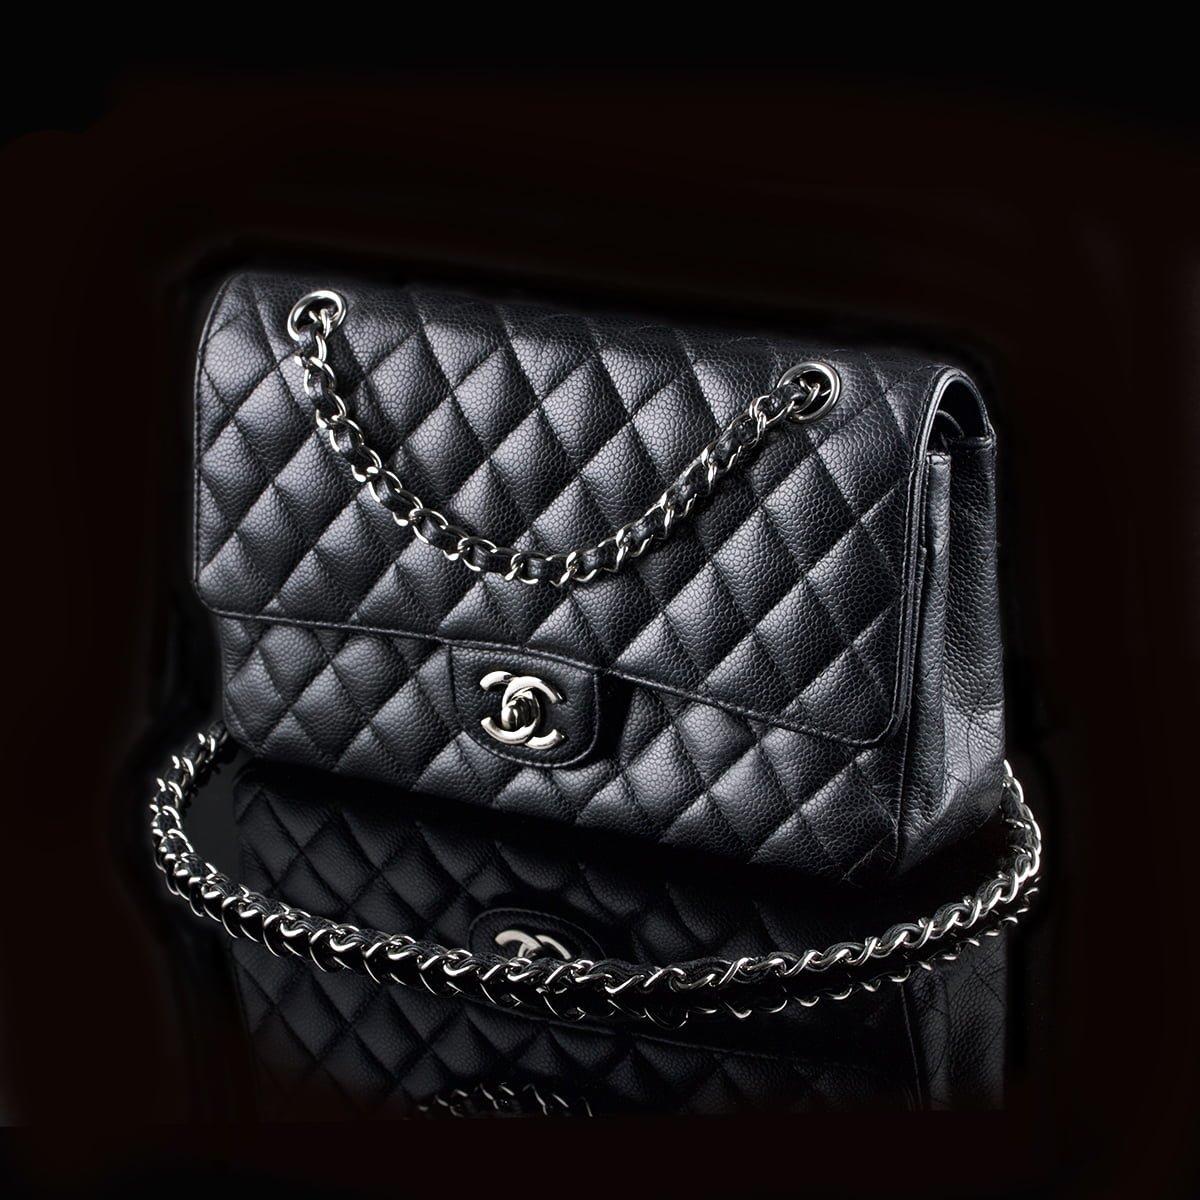 8731e4e9e96 Chanel 2.55 Timeless Classic Flap Medium Black Caviar - Classic390